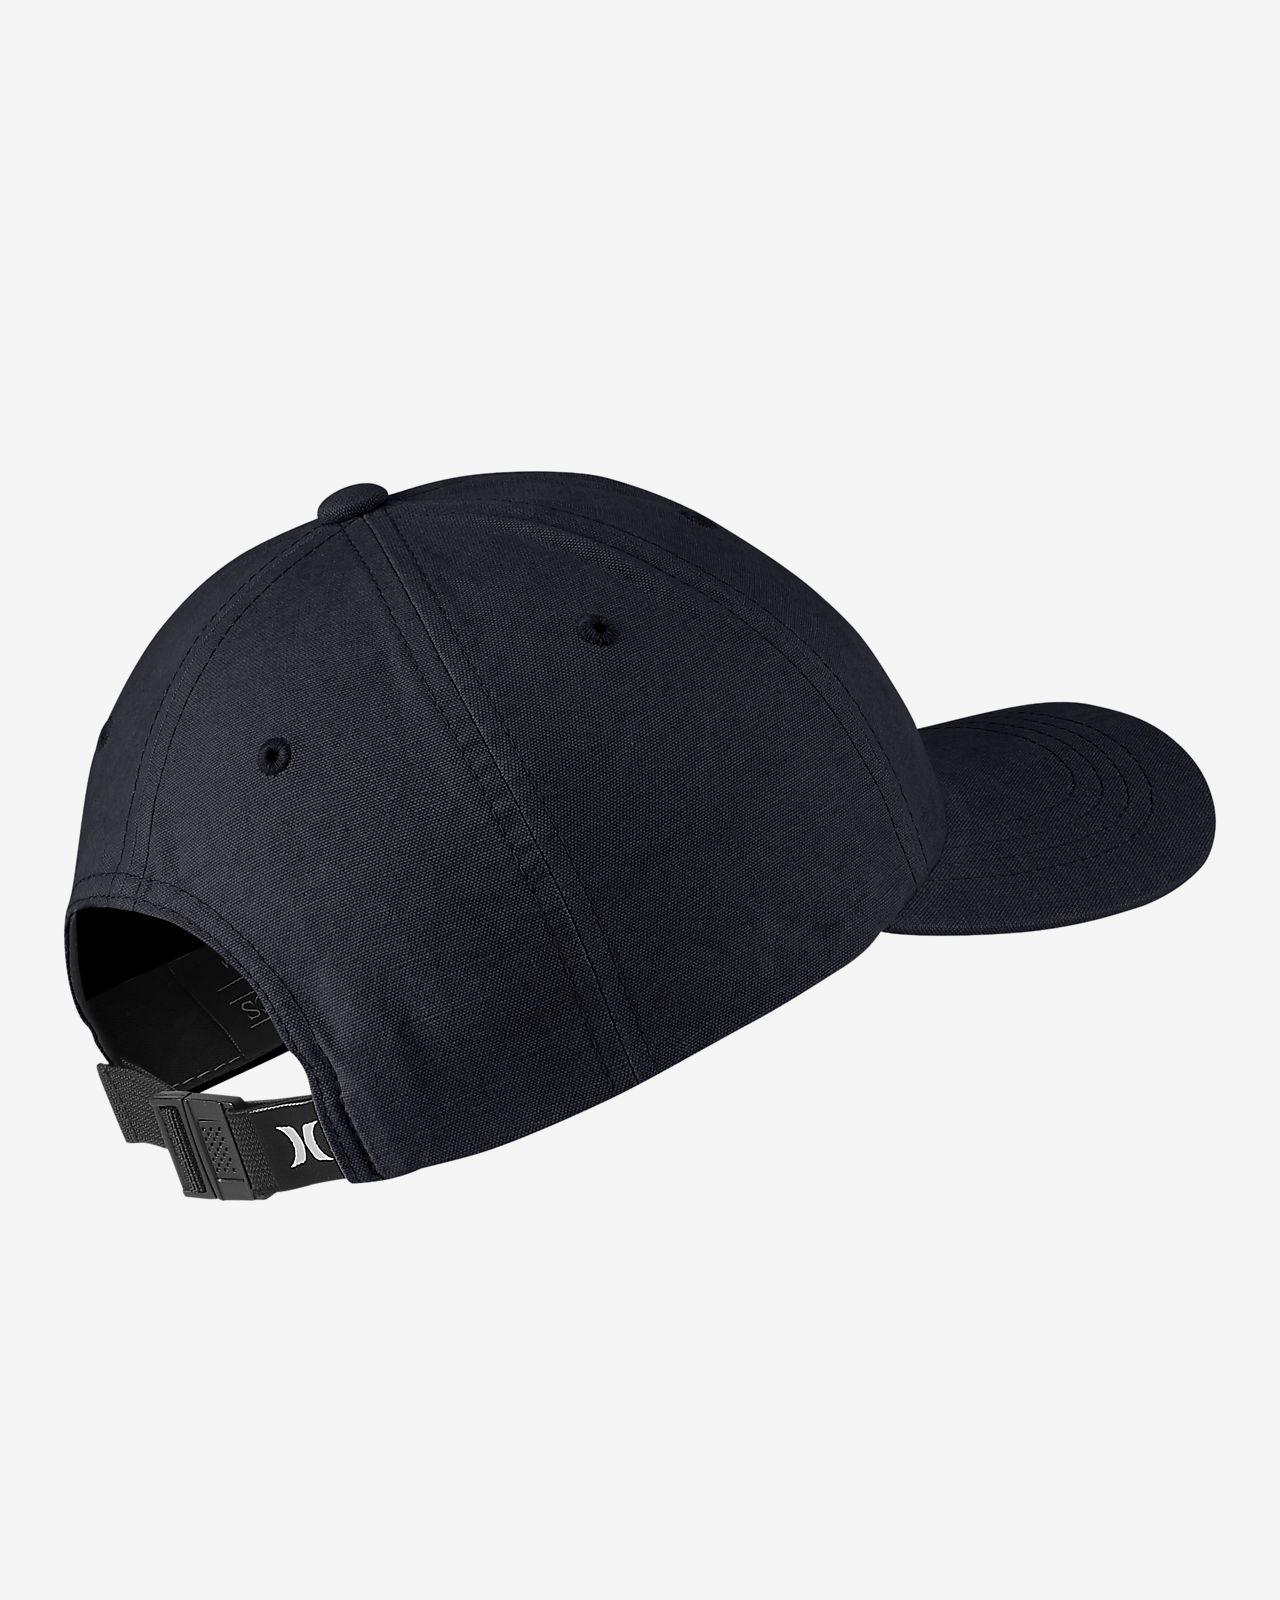 b315dd23d757 Low Resolution Ανδρικό καπέλο Hurley Andy Ανδρικό καπέλο Hurley Andy